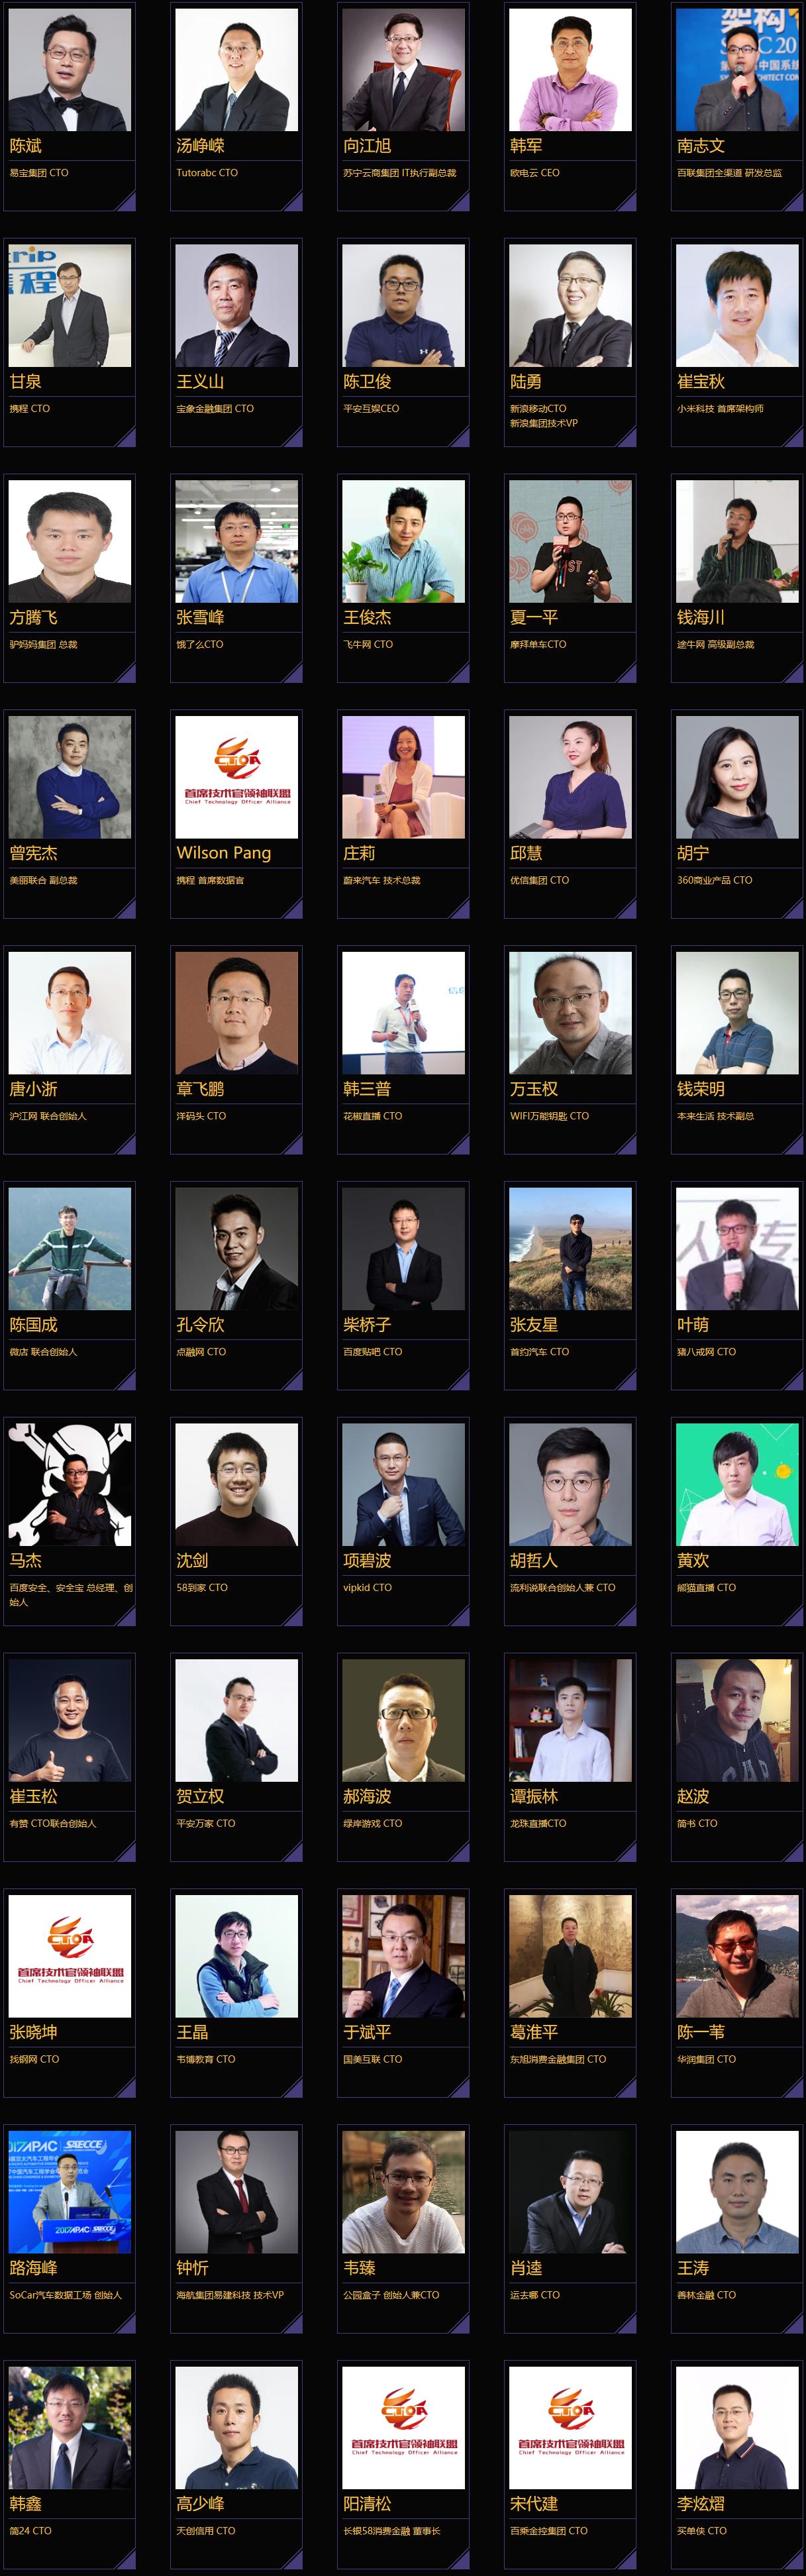 2018 CTDC年度技术领袖暨首席技术官领袖联盟年会